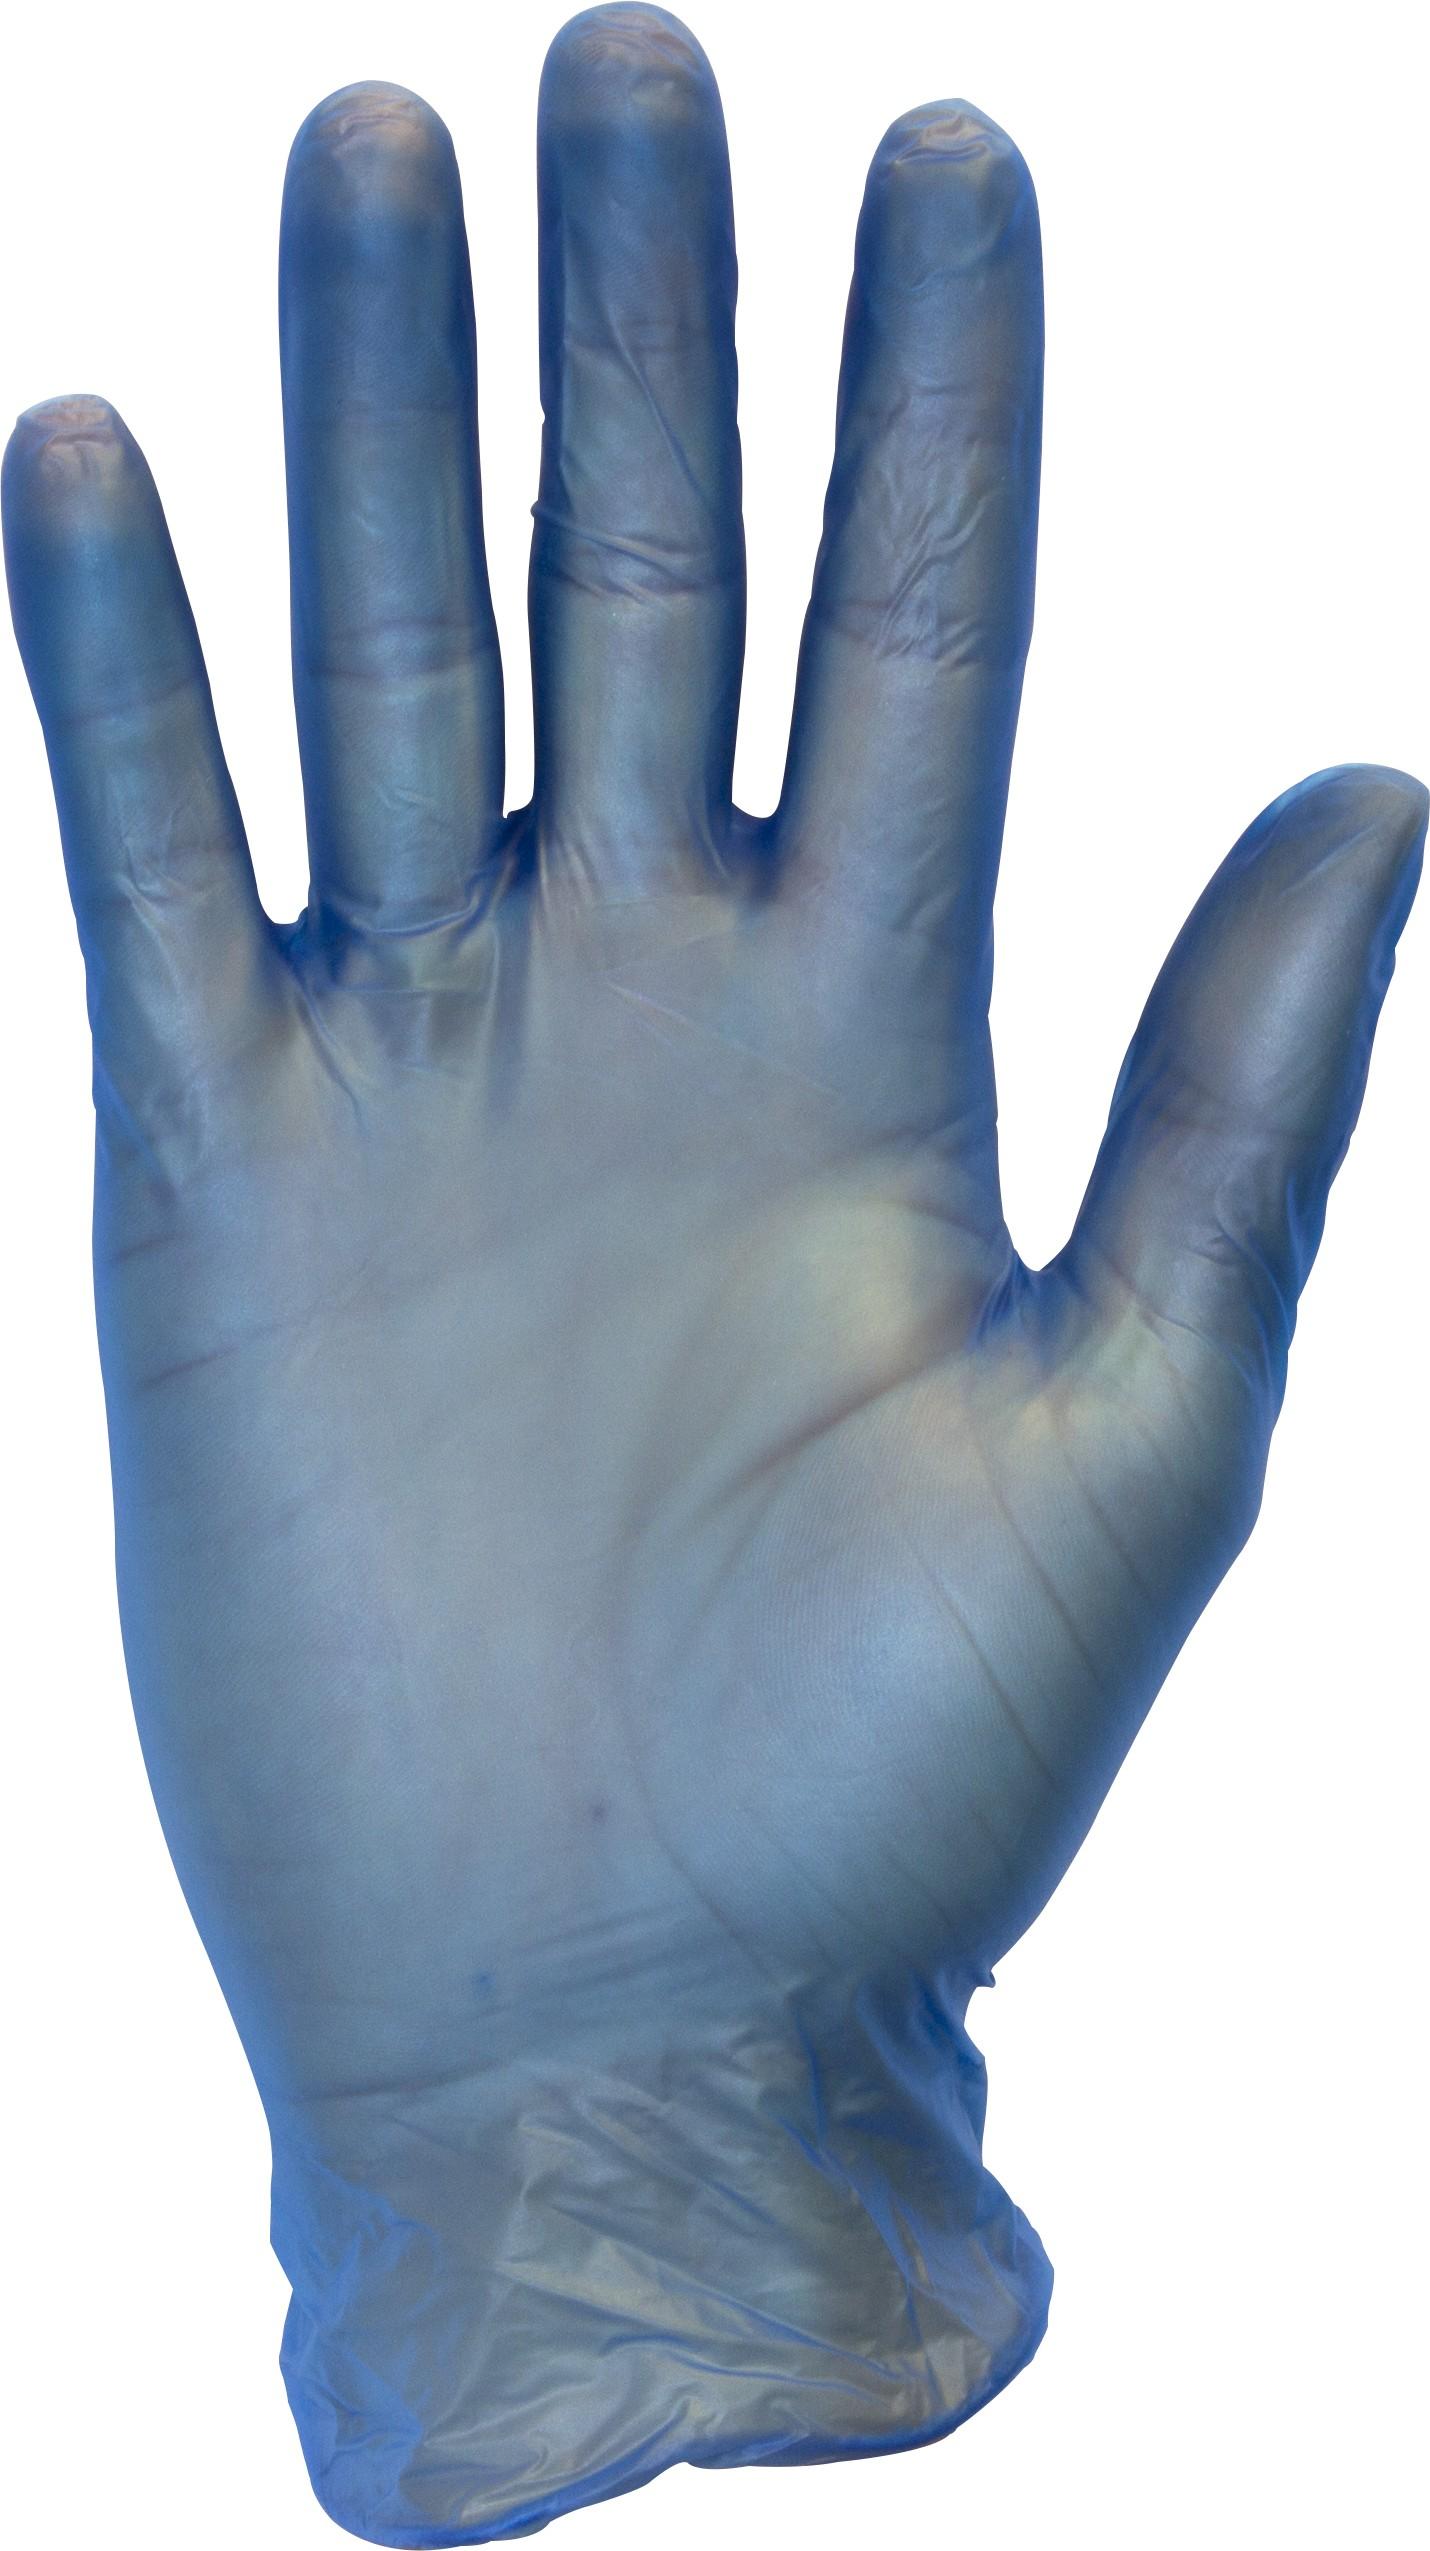 Blue Standard Powder Free Vinyl